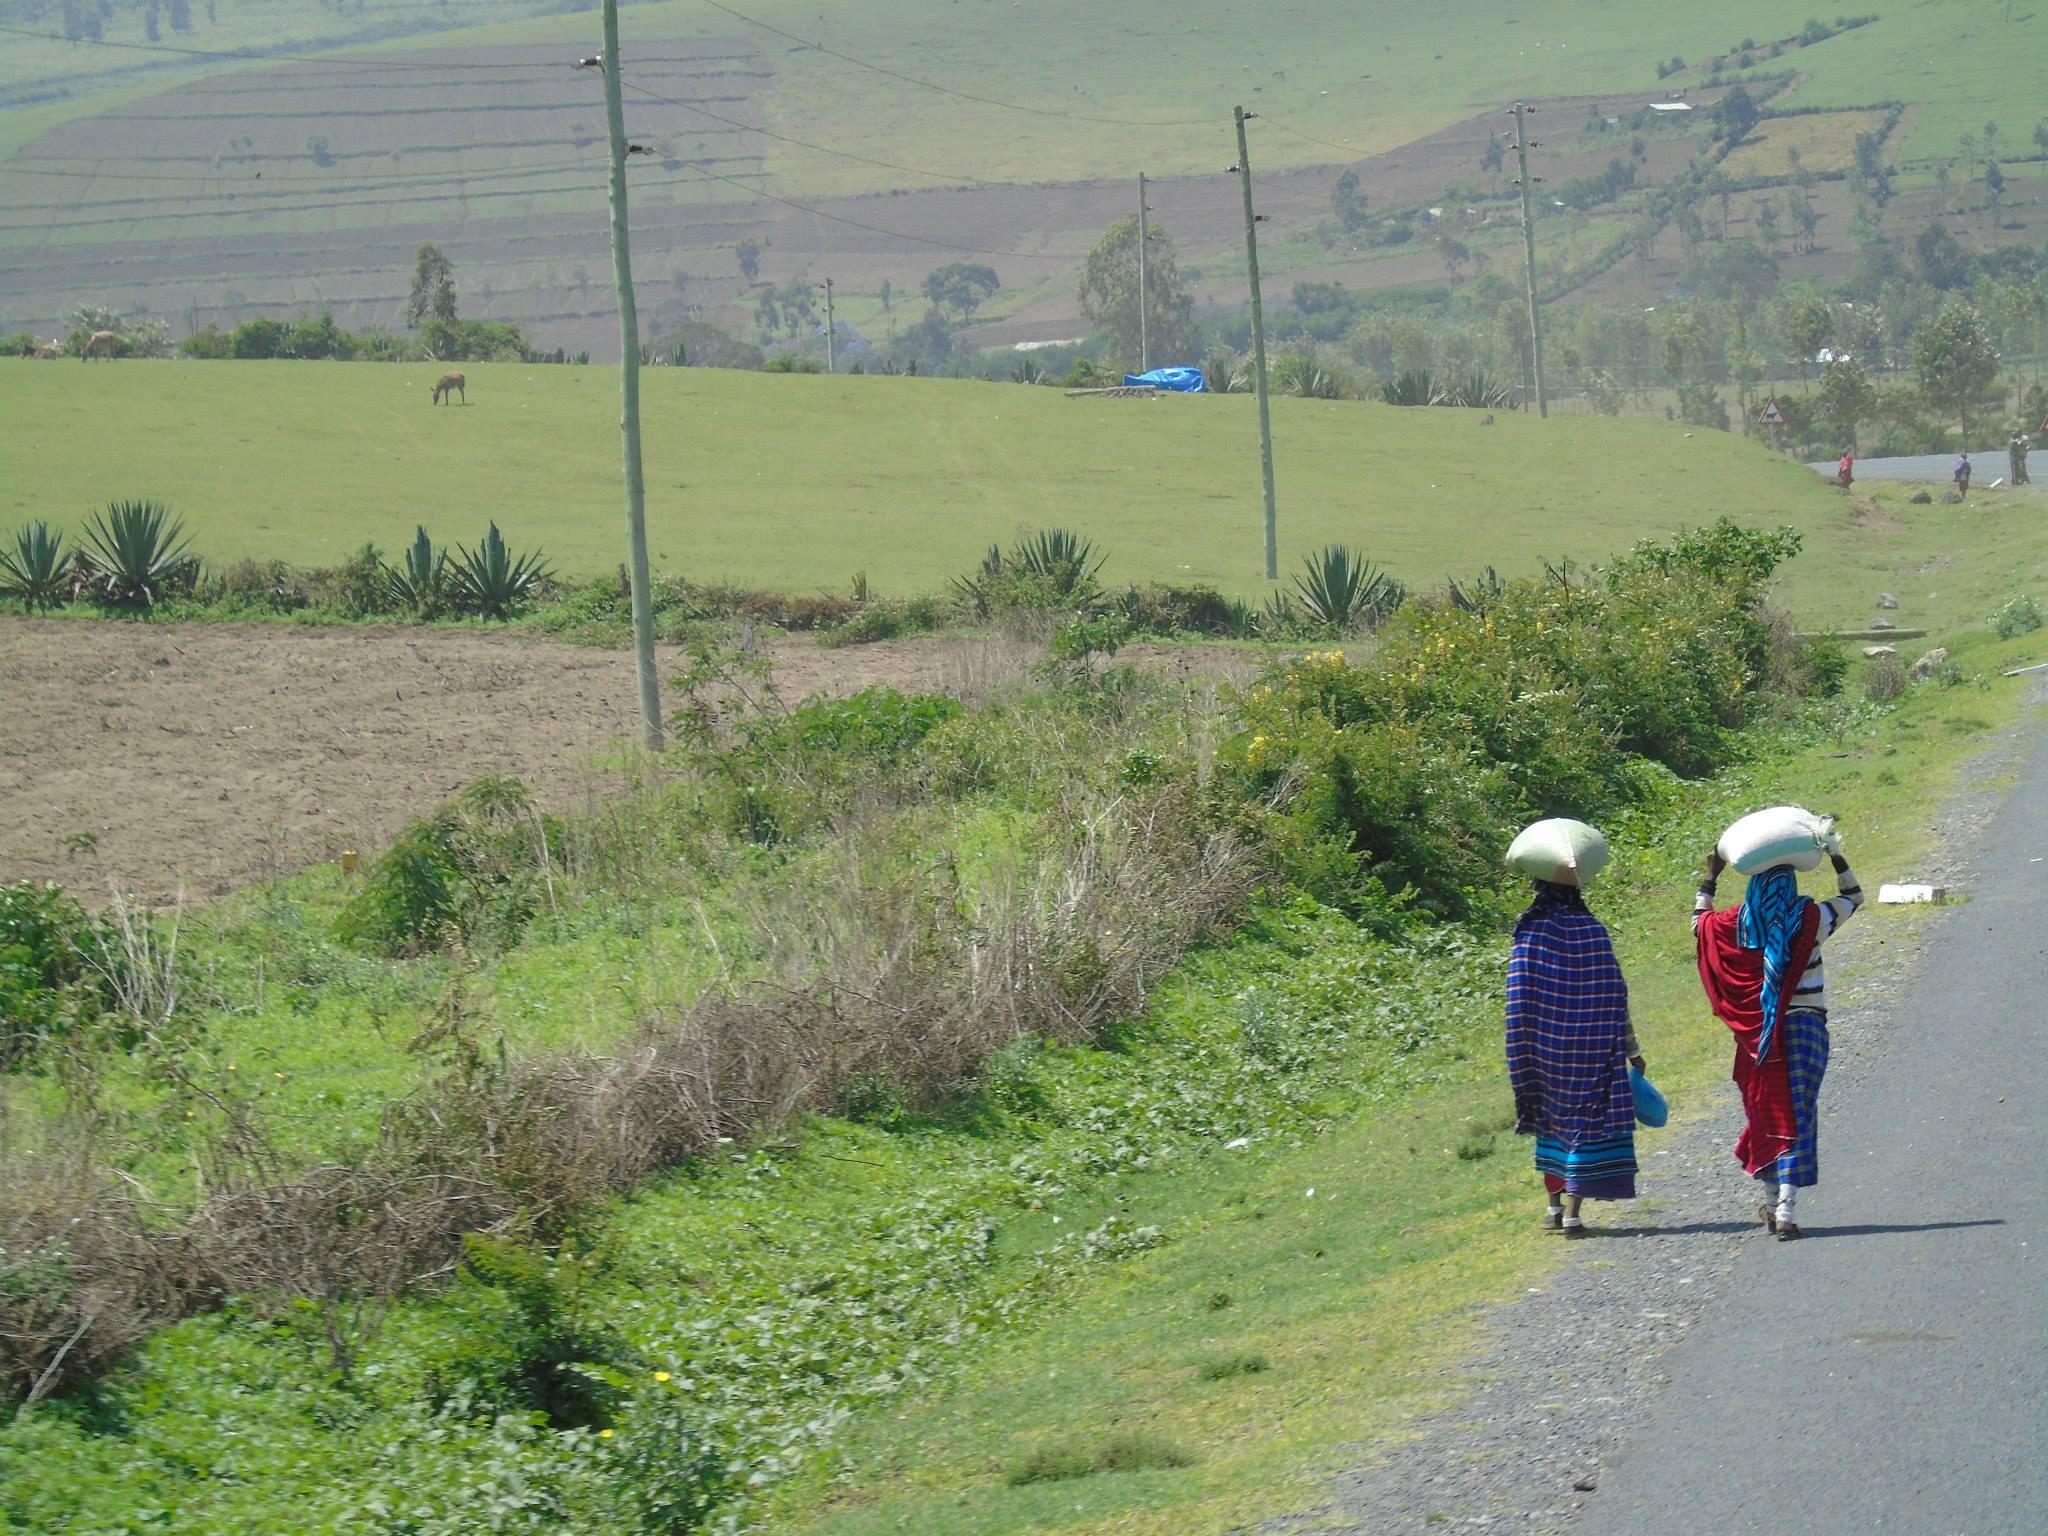 Photo of two women walking in Tanzania courtesy of Jason Ho.